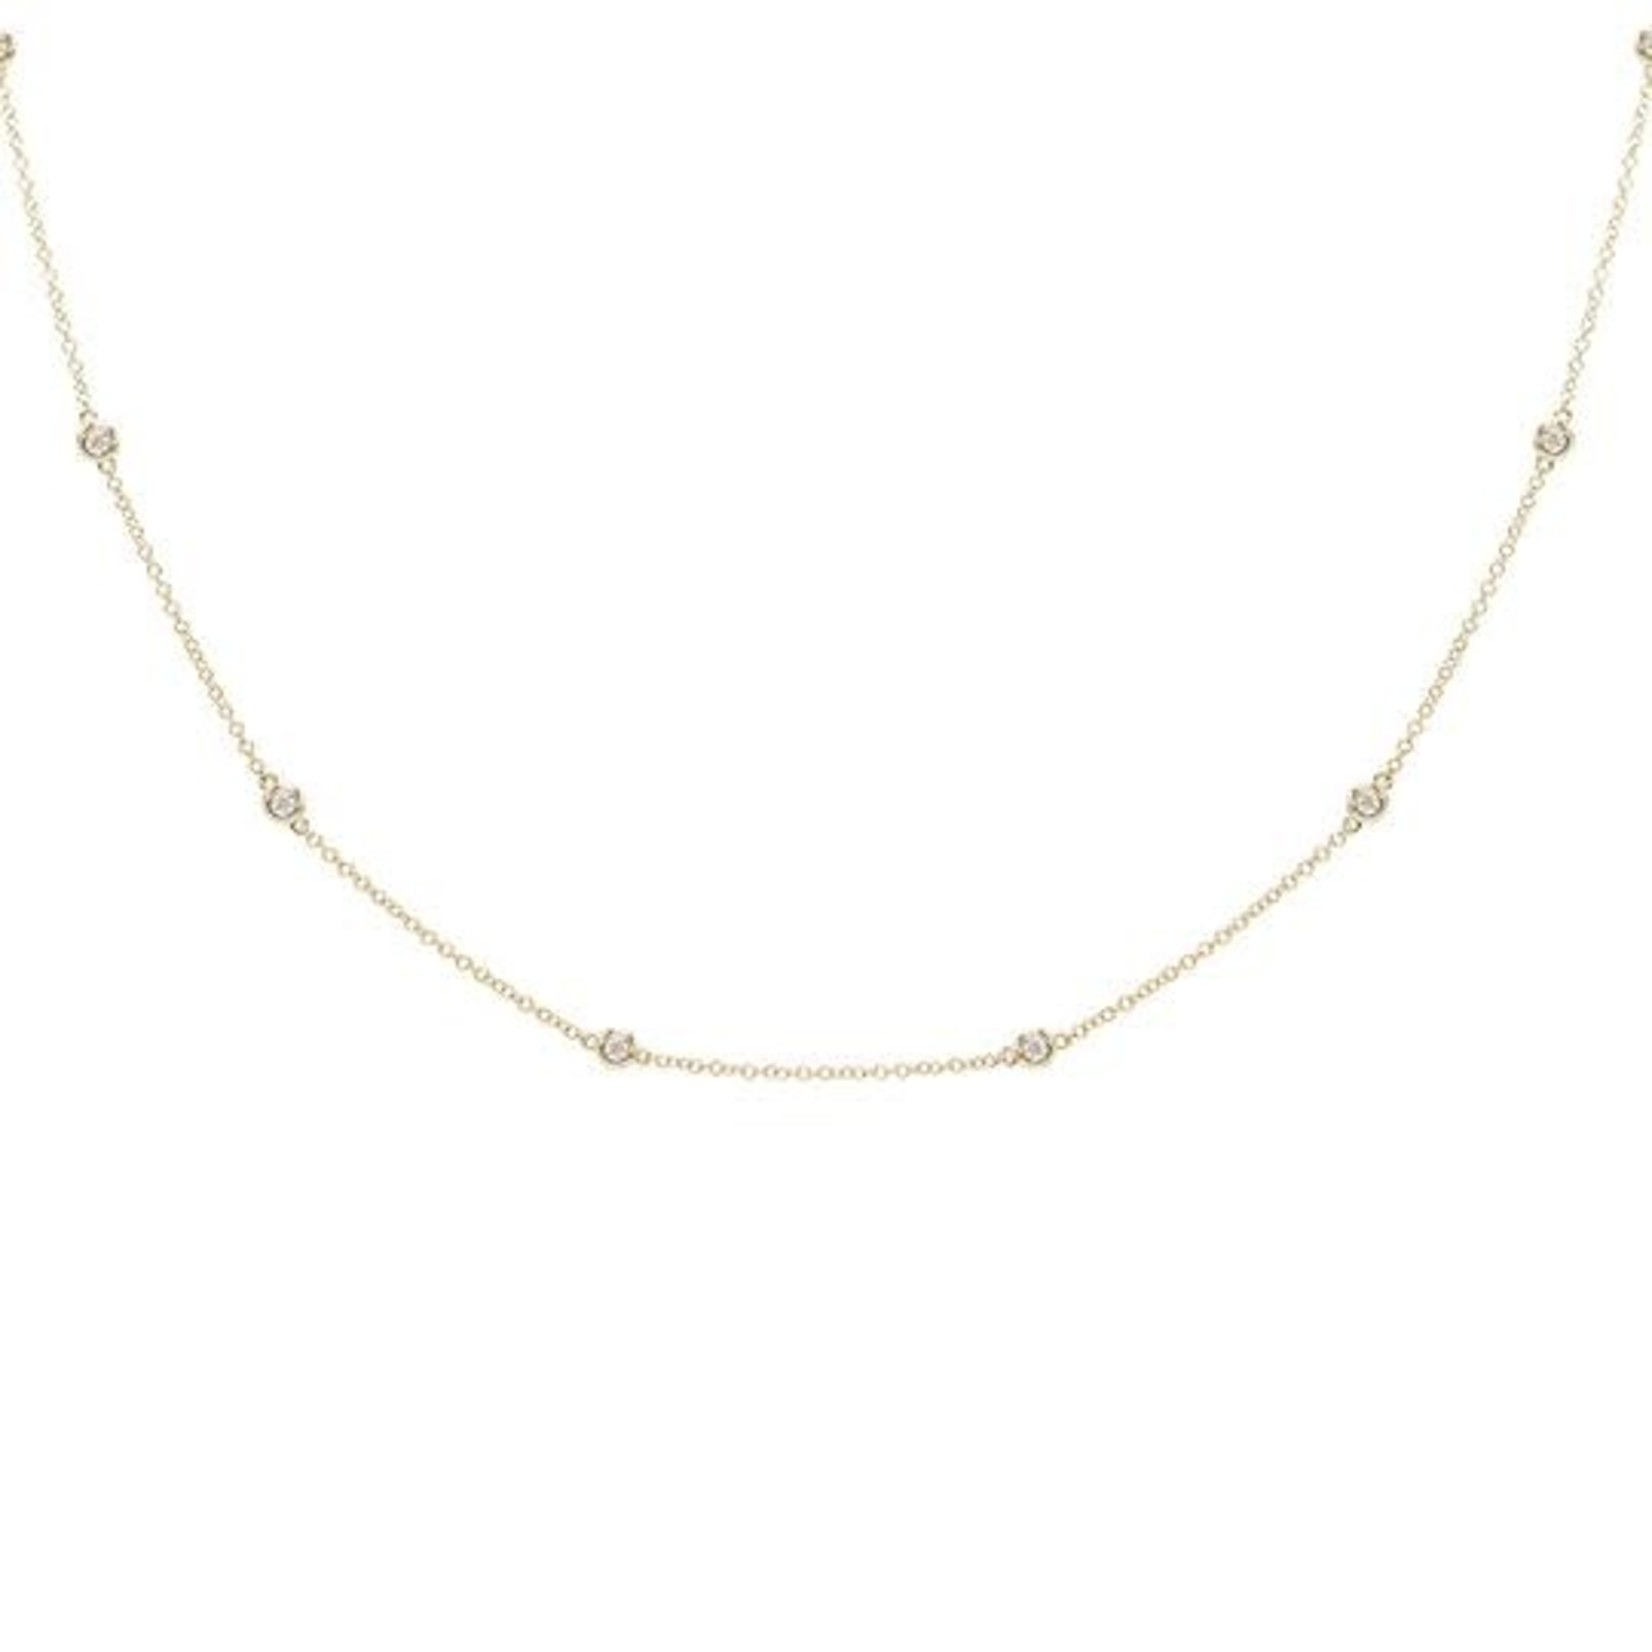 Adinas Diamond Bezel Chain Necklace 14k